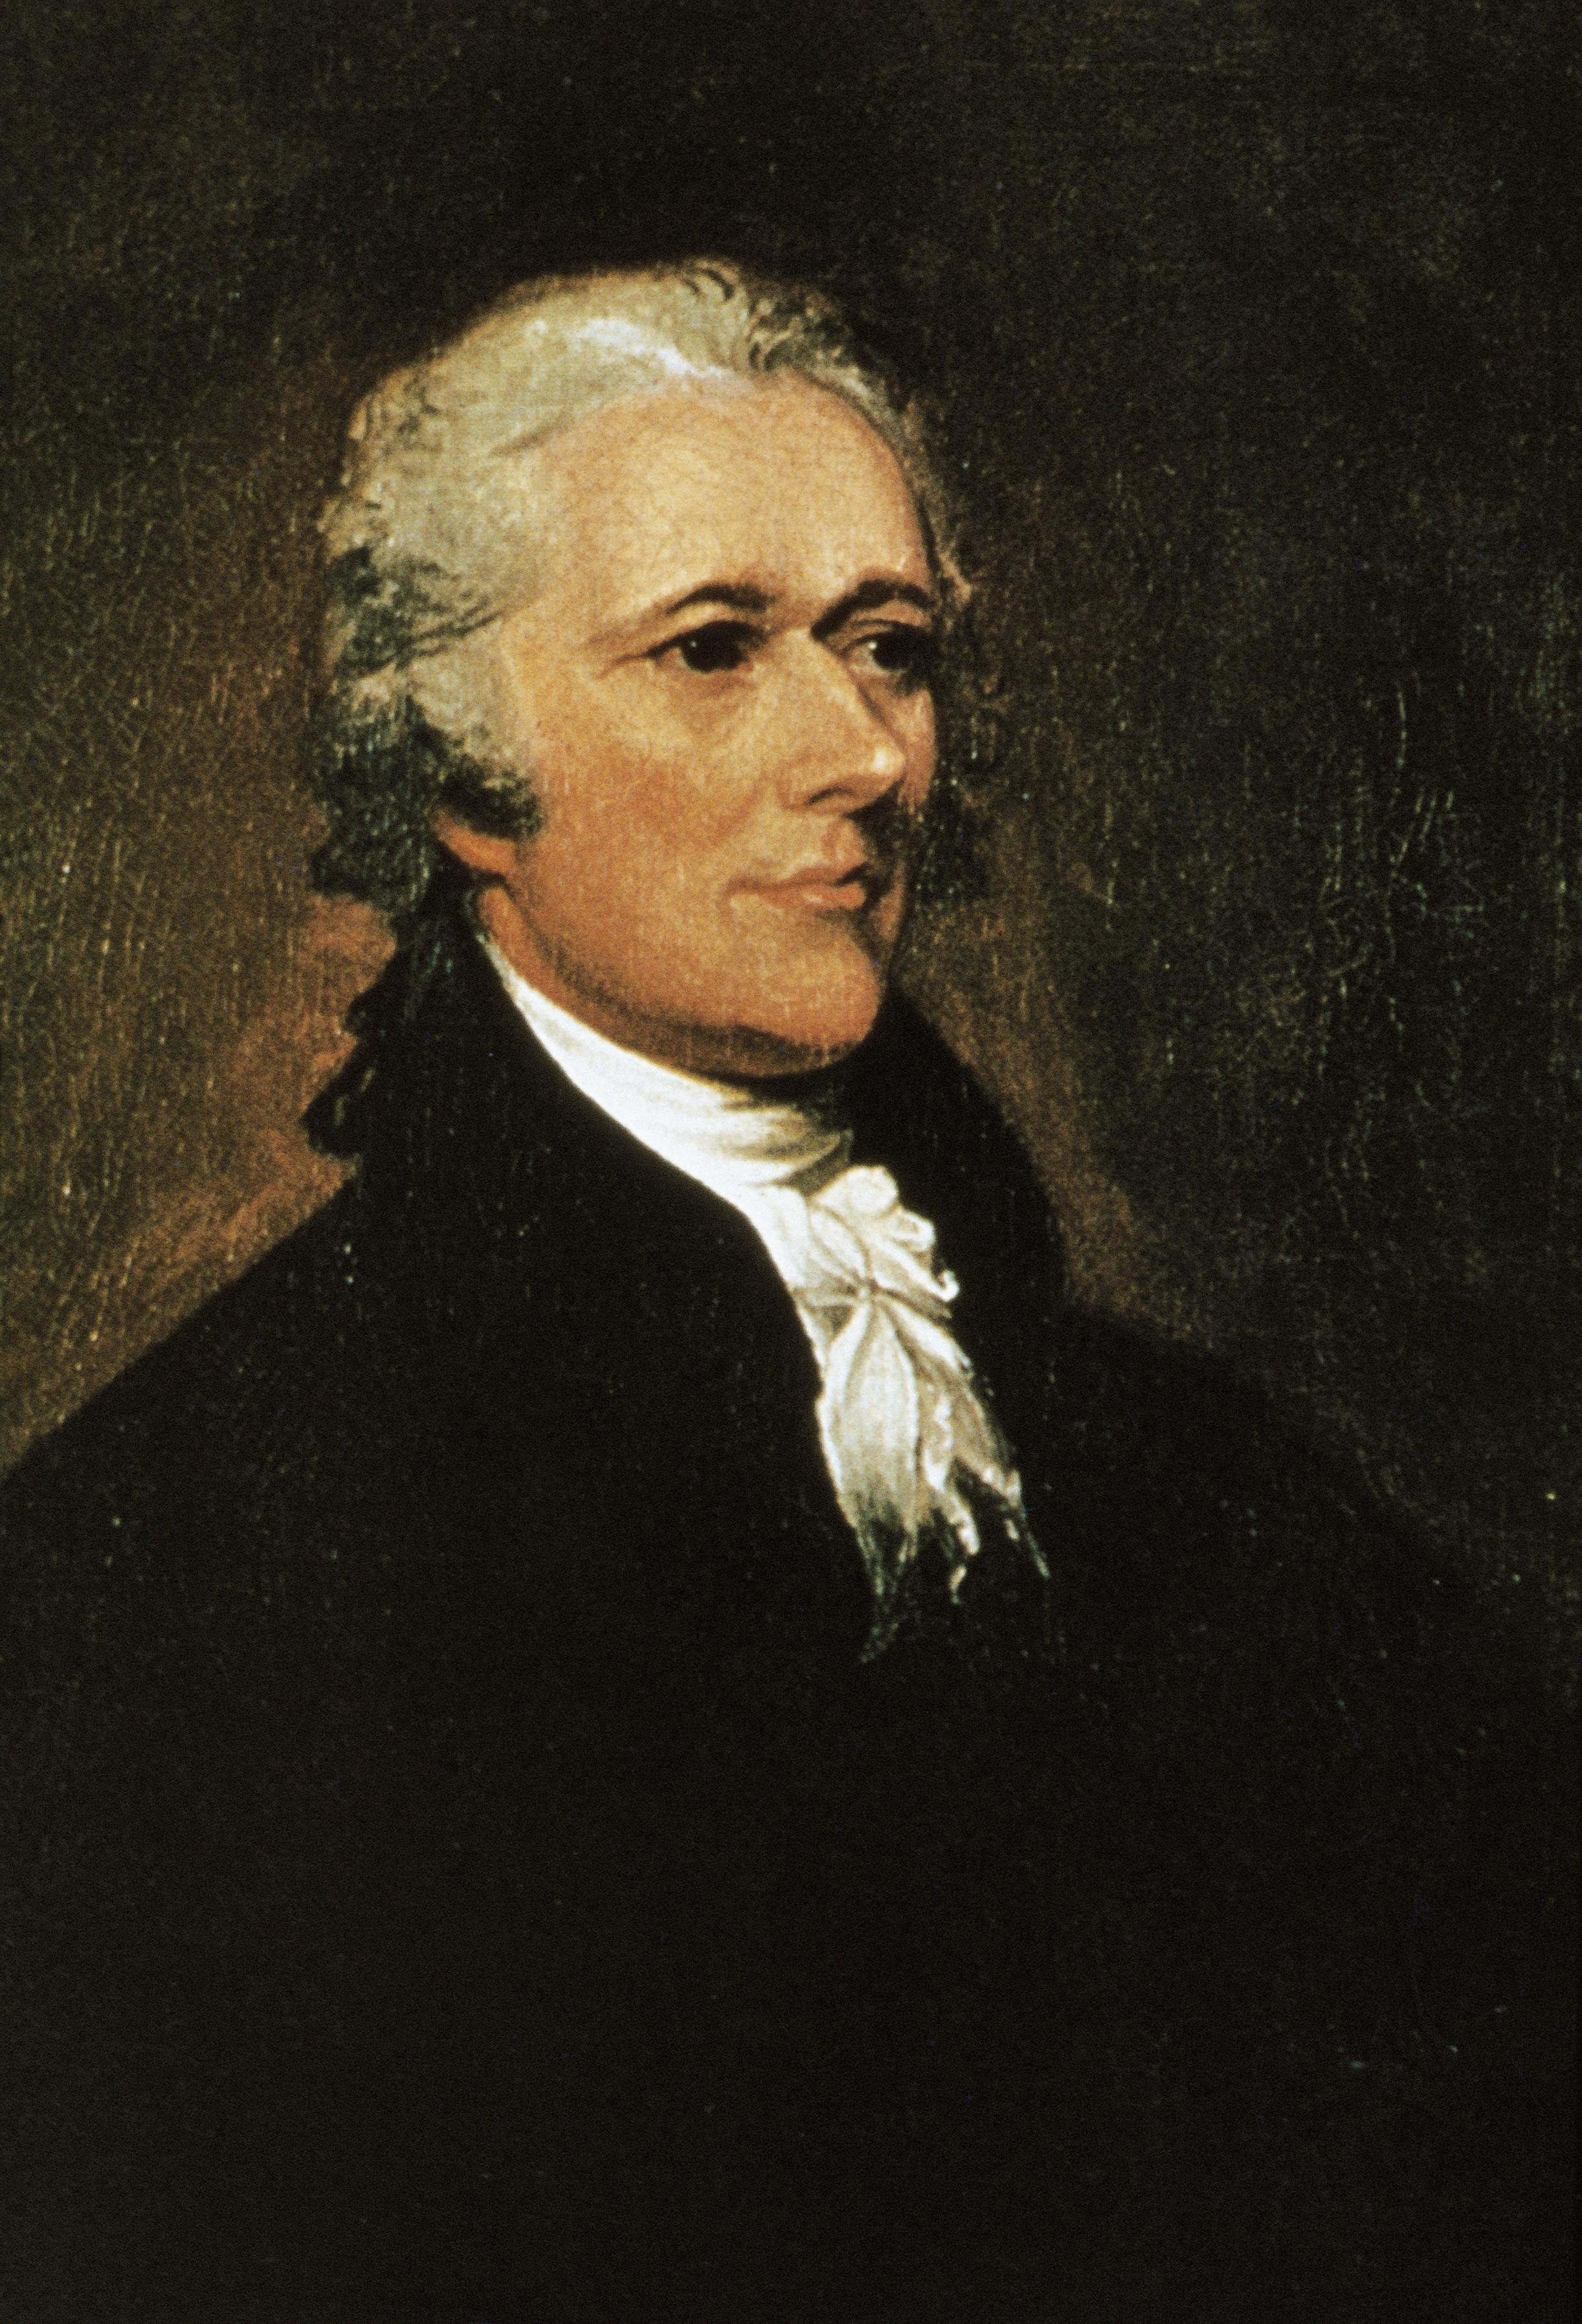 Portrait of Alexander Hamilton (1757-1804), American politician. Painting  by John